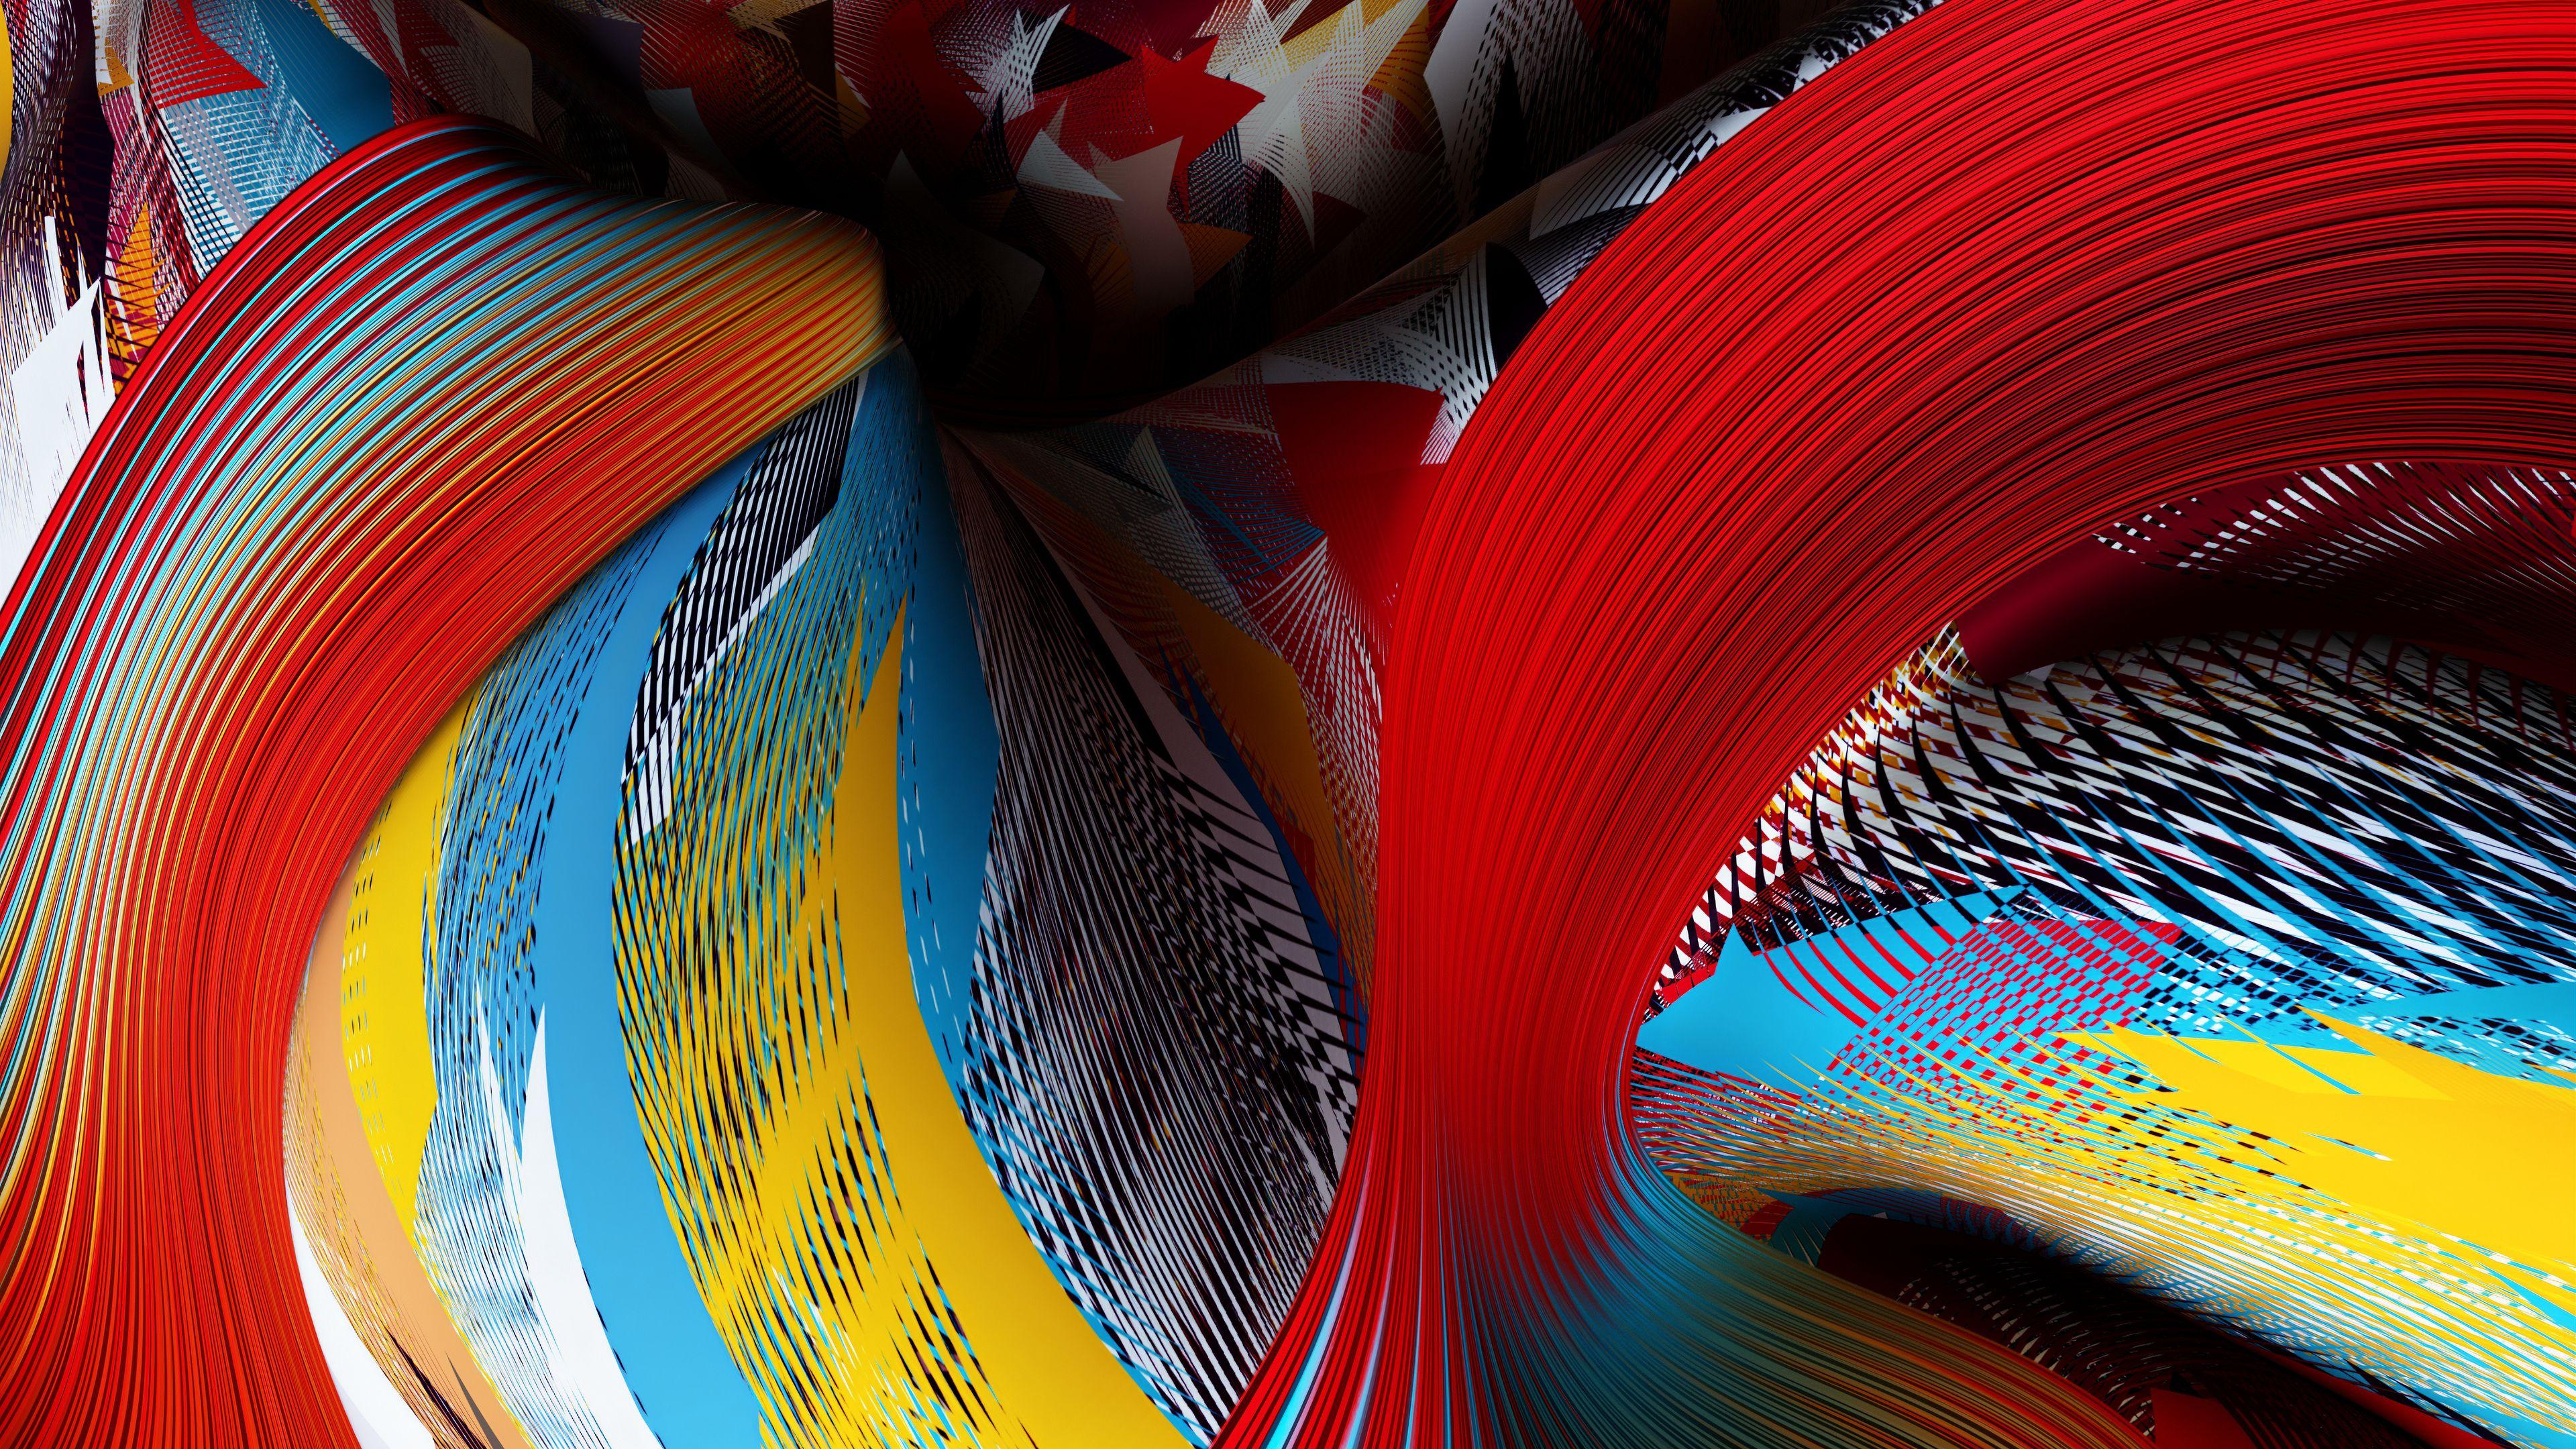 Perfect Art Of Abstract Hd Wallpapers Digital Art Wallpapers Behance Wallpapers Artwork Wallpapers Artist Abstract 3d Wallpaper Abstract Abstract Wallpaper